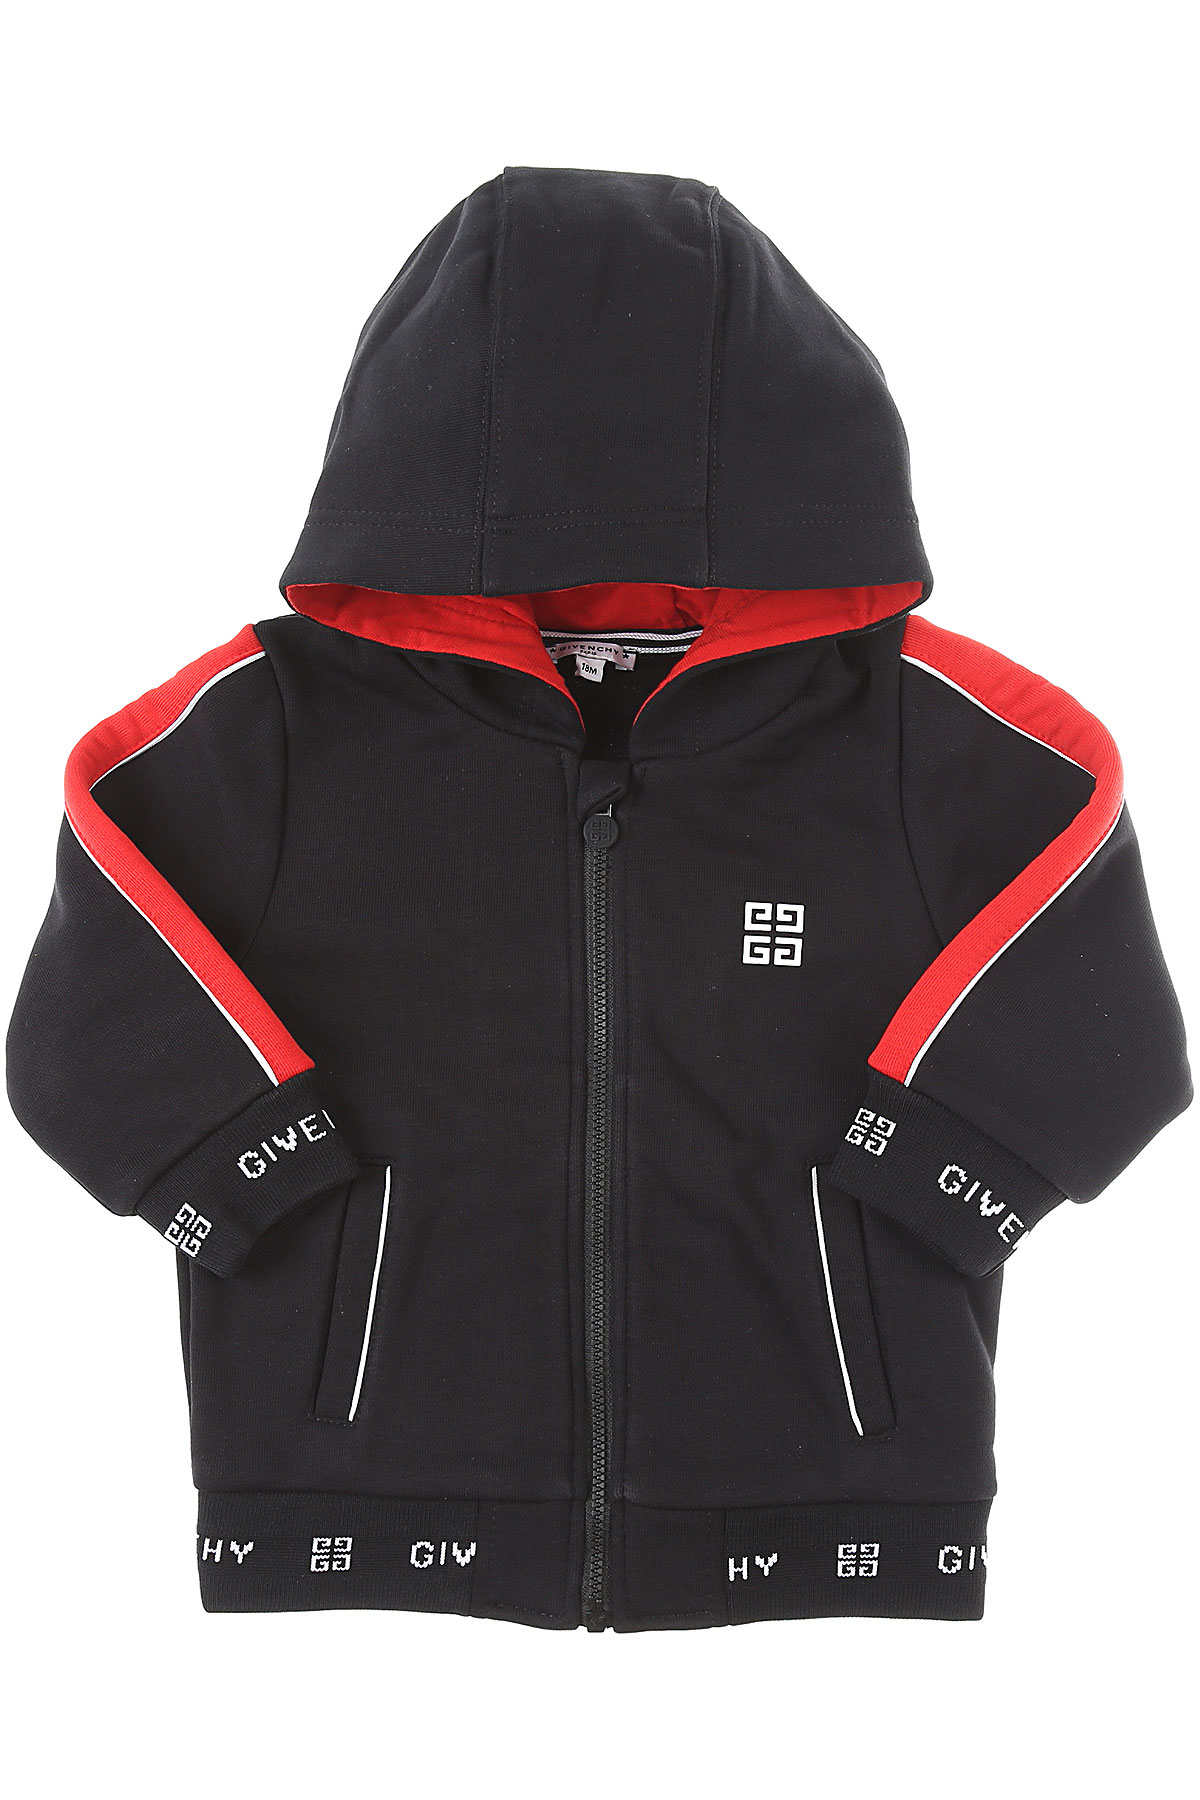 Givenchy Baby Sweatshirts & Hoodies for Boys On Sale, Black, Cotton, 2019, 12 M 18M 2Y 3Y 9M